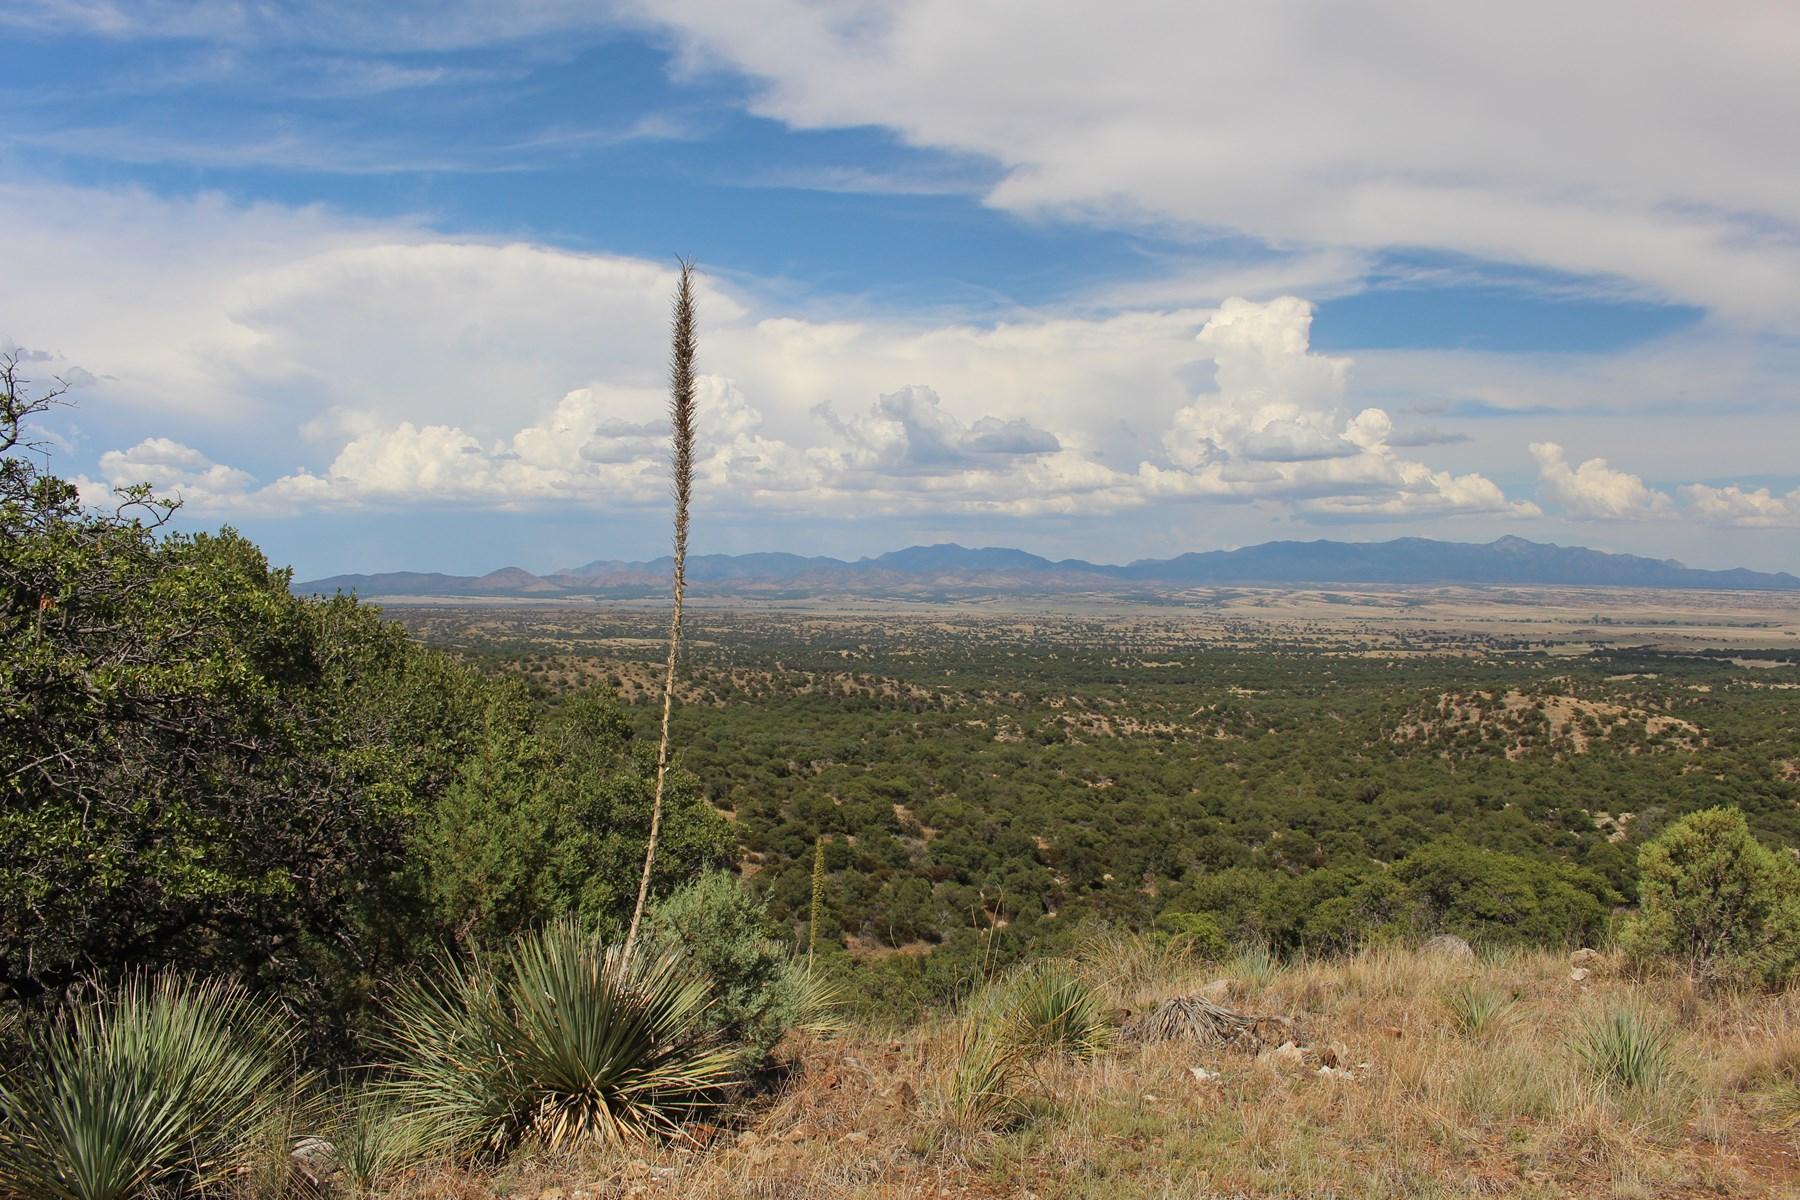 REDUCED! Expansive mountain top views of San Rafael Valley